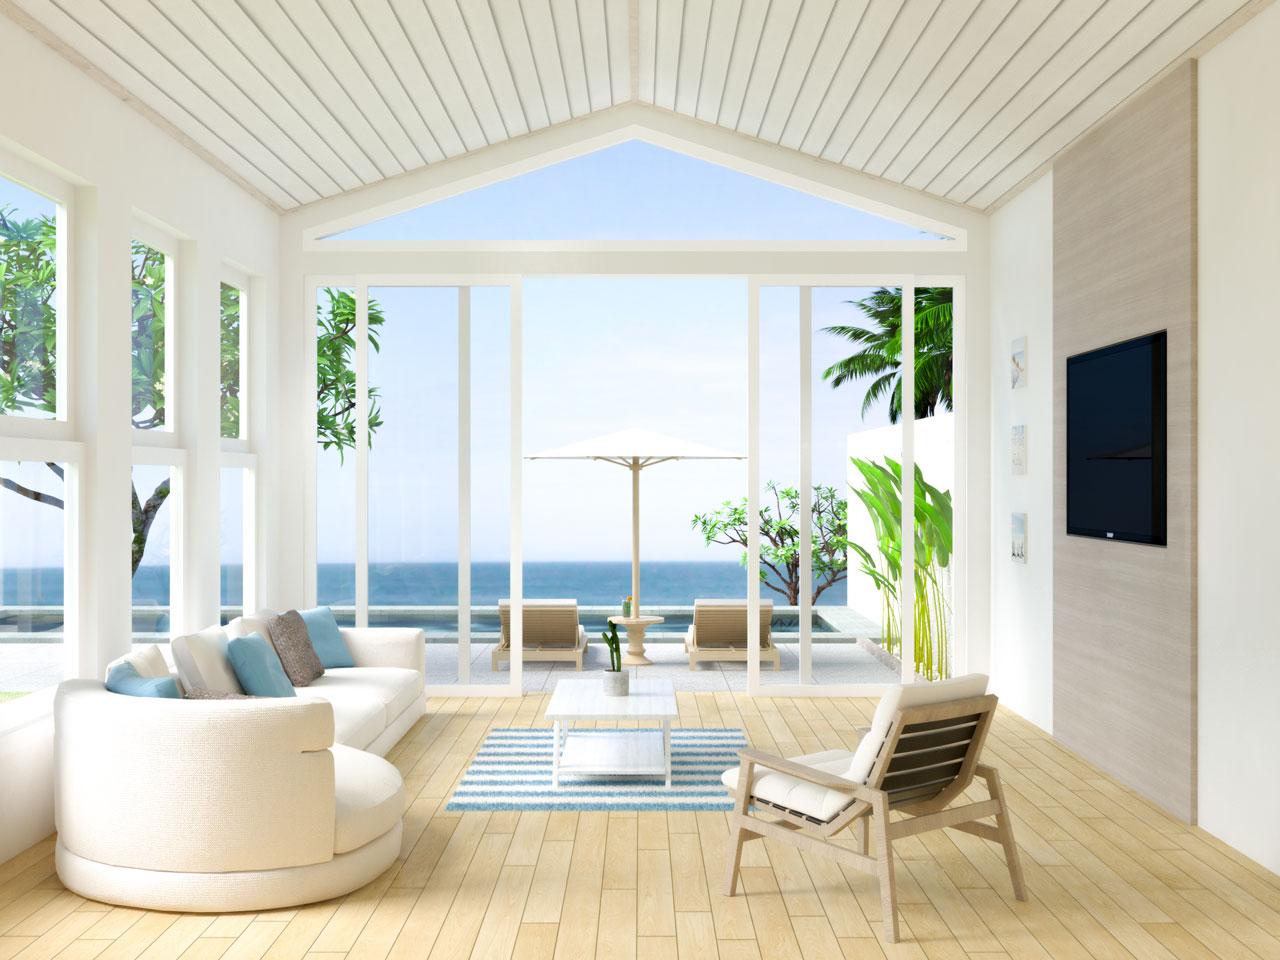 Beach house living room with light natural hardwood flooring